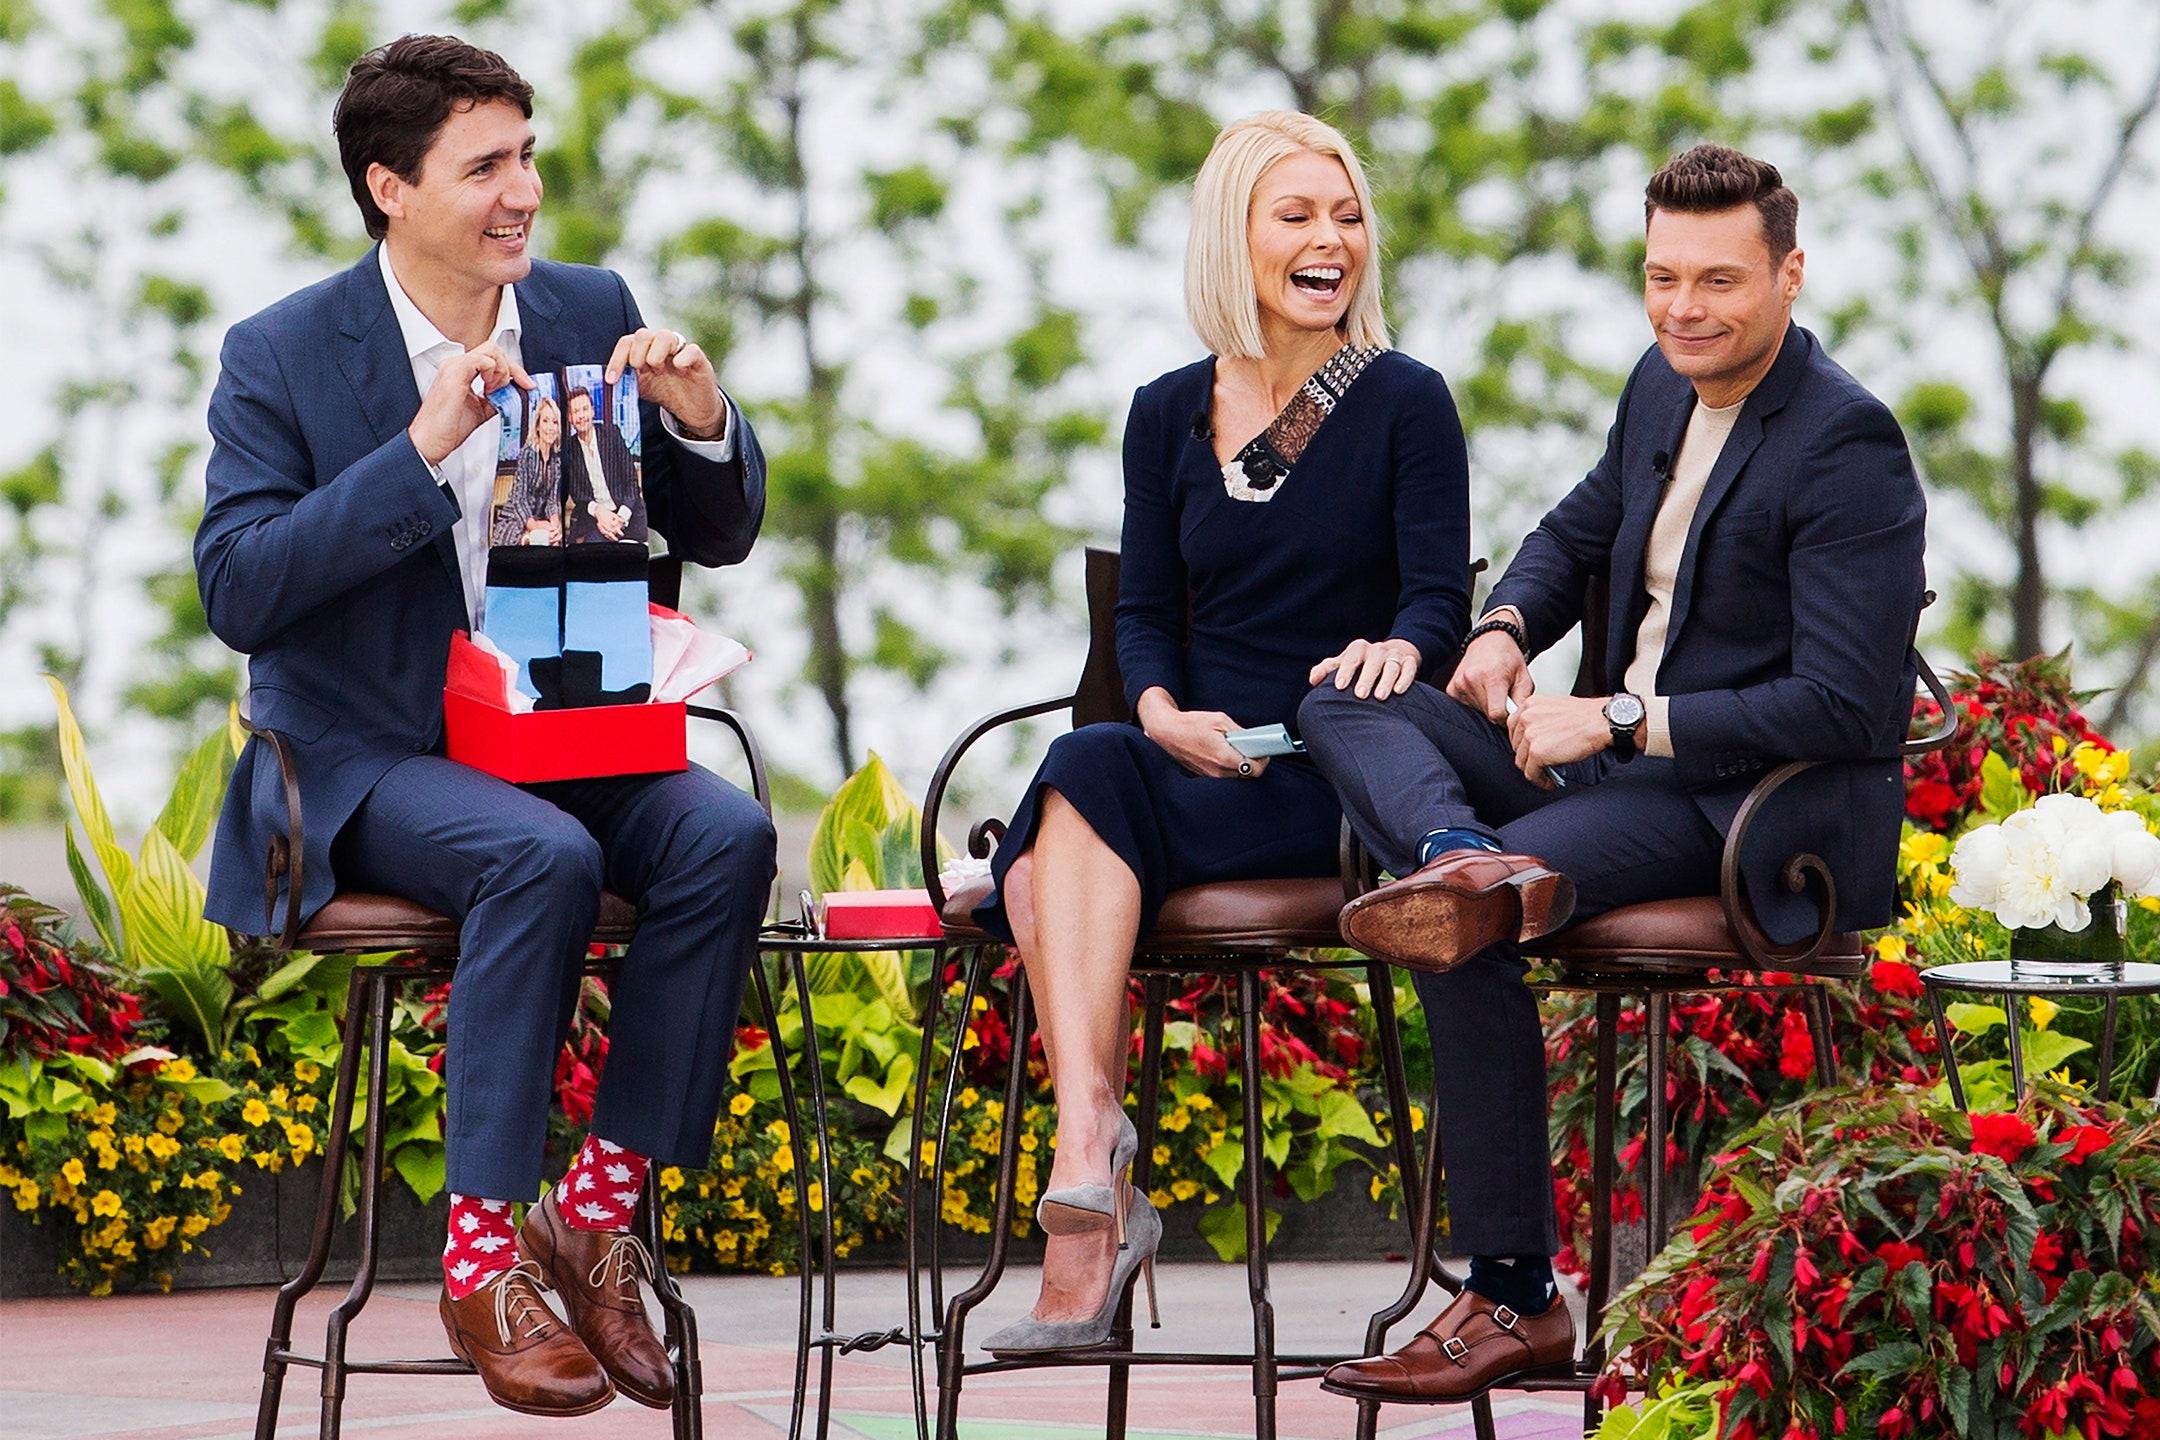 Justin Trudeau *Really* Loves Fun Socks Photos | GQ